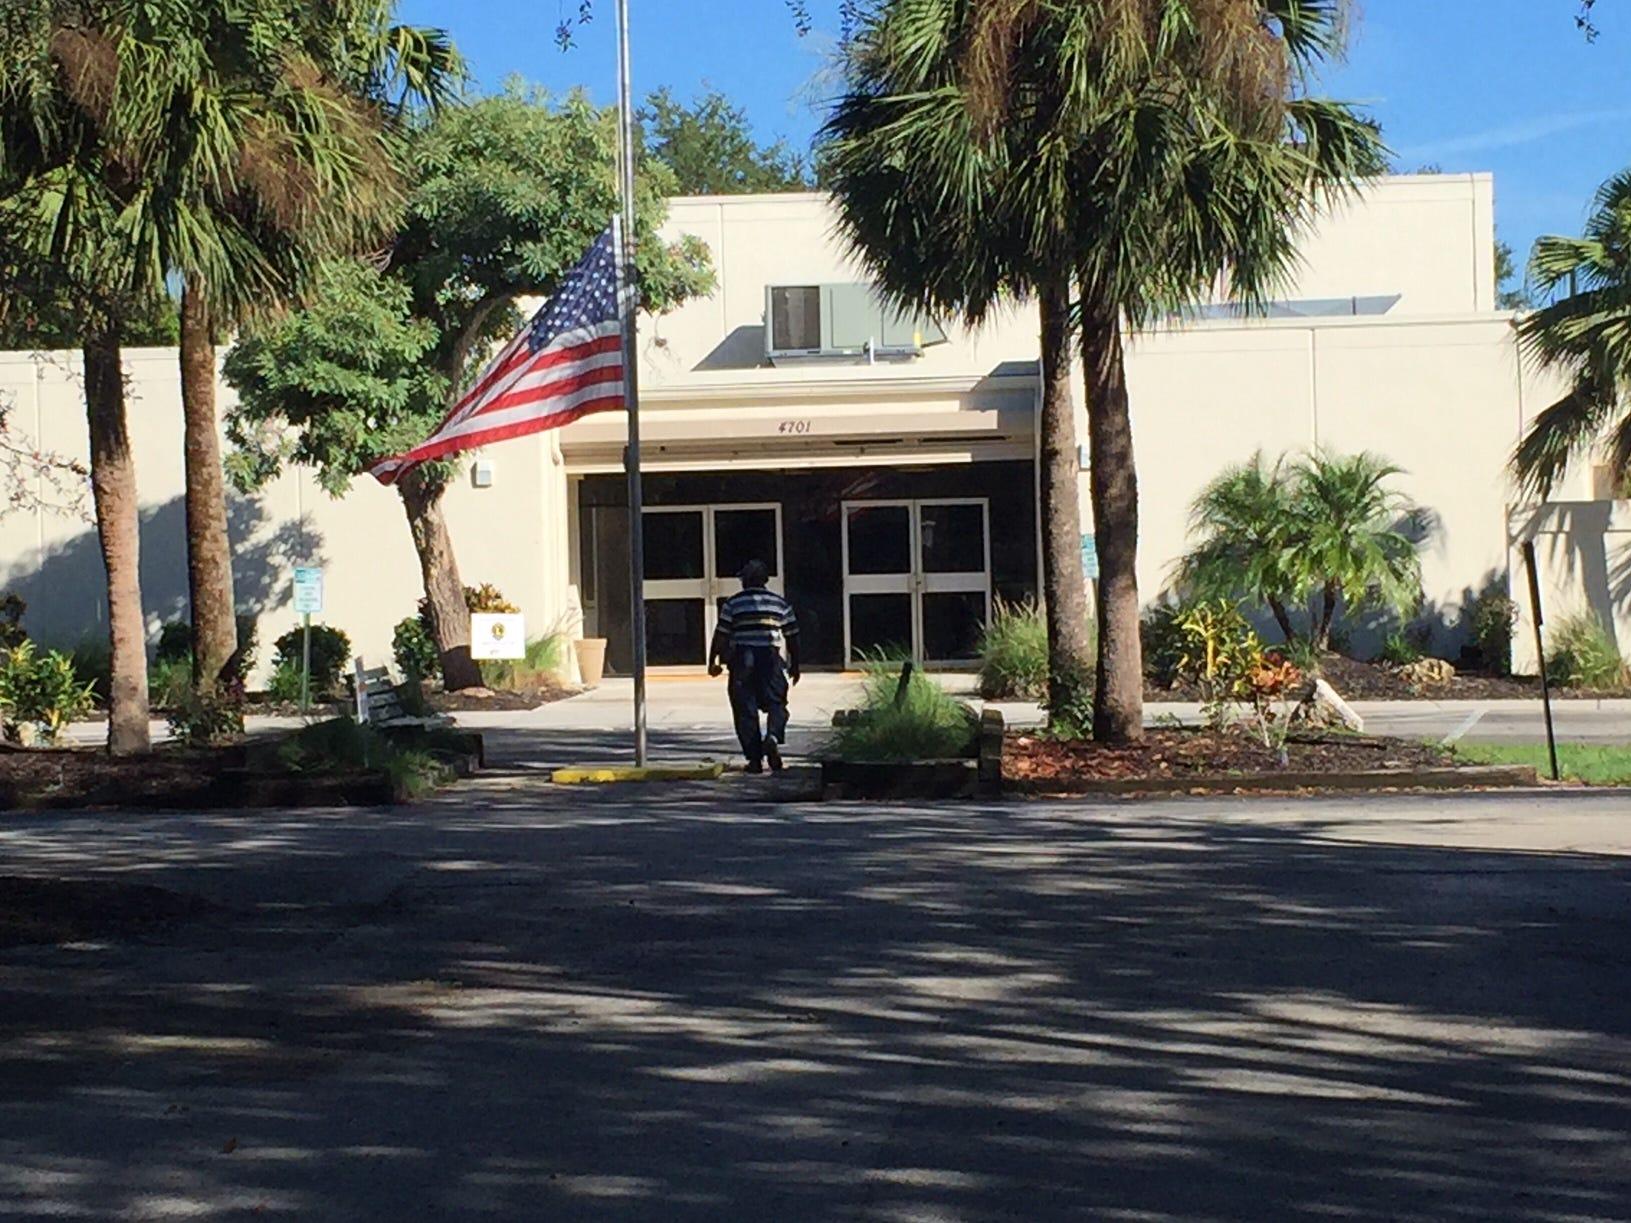 A person walks toward the  Golden Gate Community Center, precinct 323, on Aug. 28, 2018.